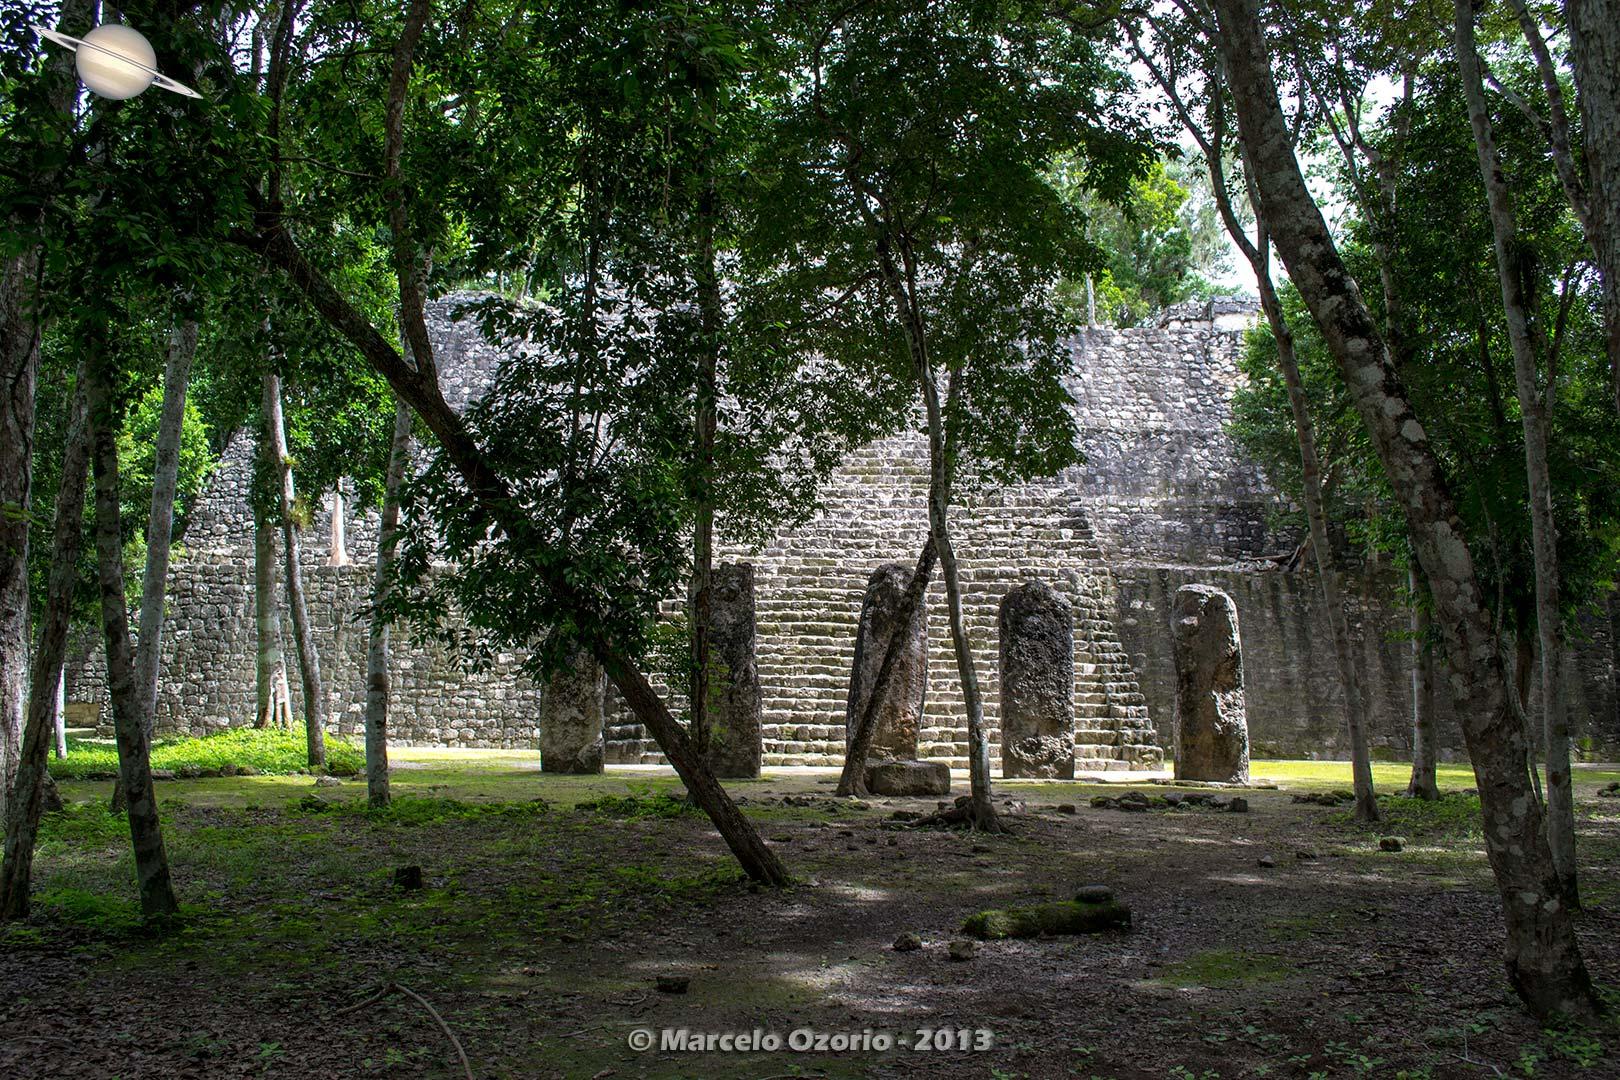 calakmul mayan civilization mexico 21 - Calakmul, City of the Two Adjacent Pyramids - Mexico